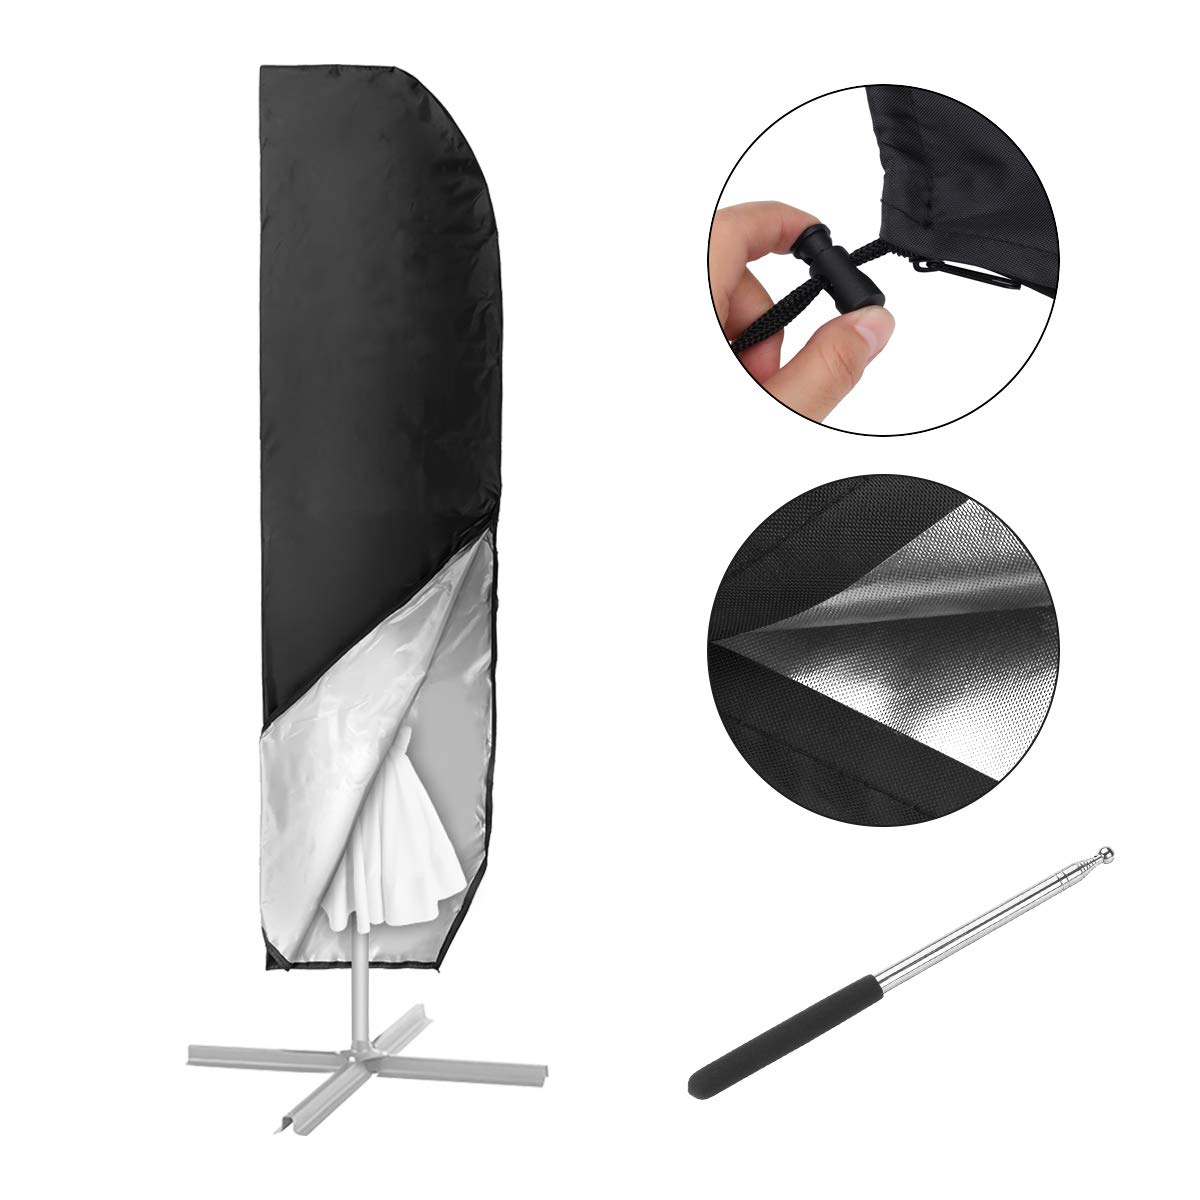 mohoo sonnenschirm abdeckung h lle f r 4m schutzh lle. Black Bedroom Furniture Sets. Home Design Ideas